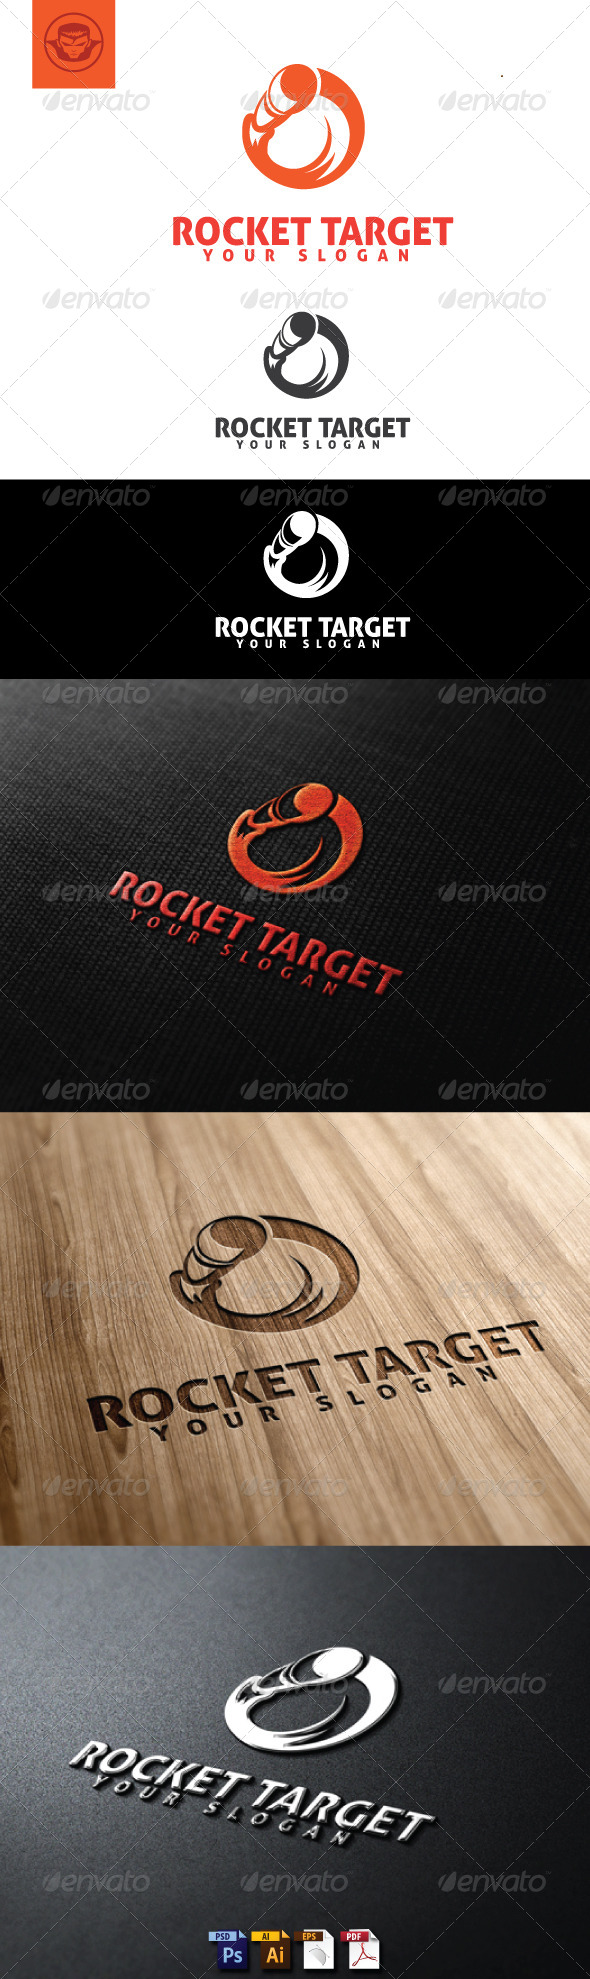 GraphicRiver Rocket Target Logo Template 4884804